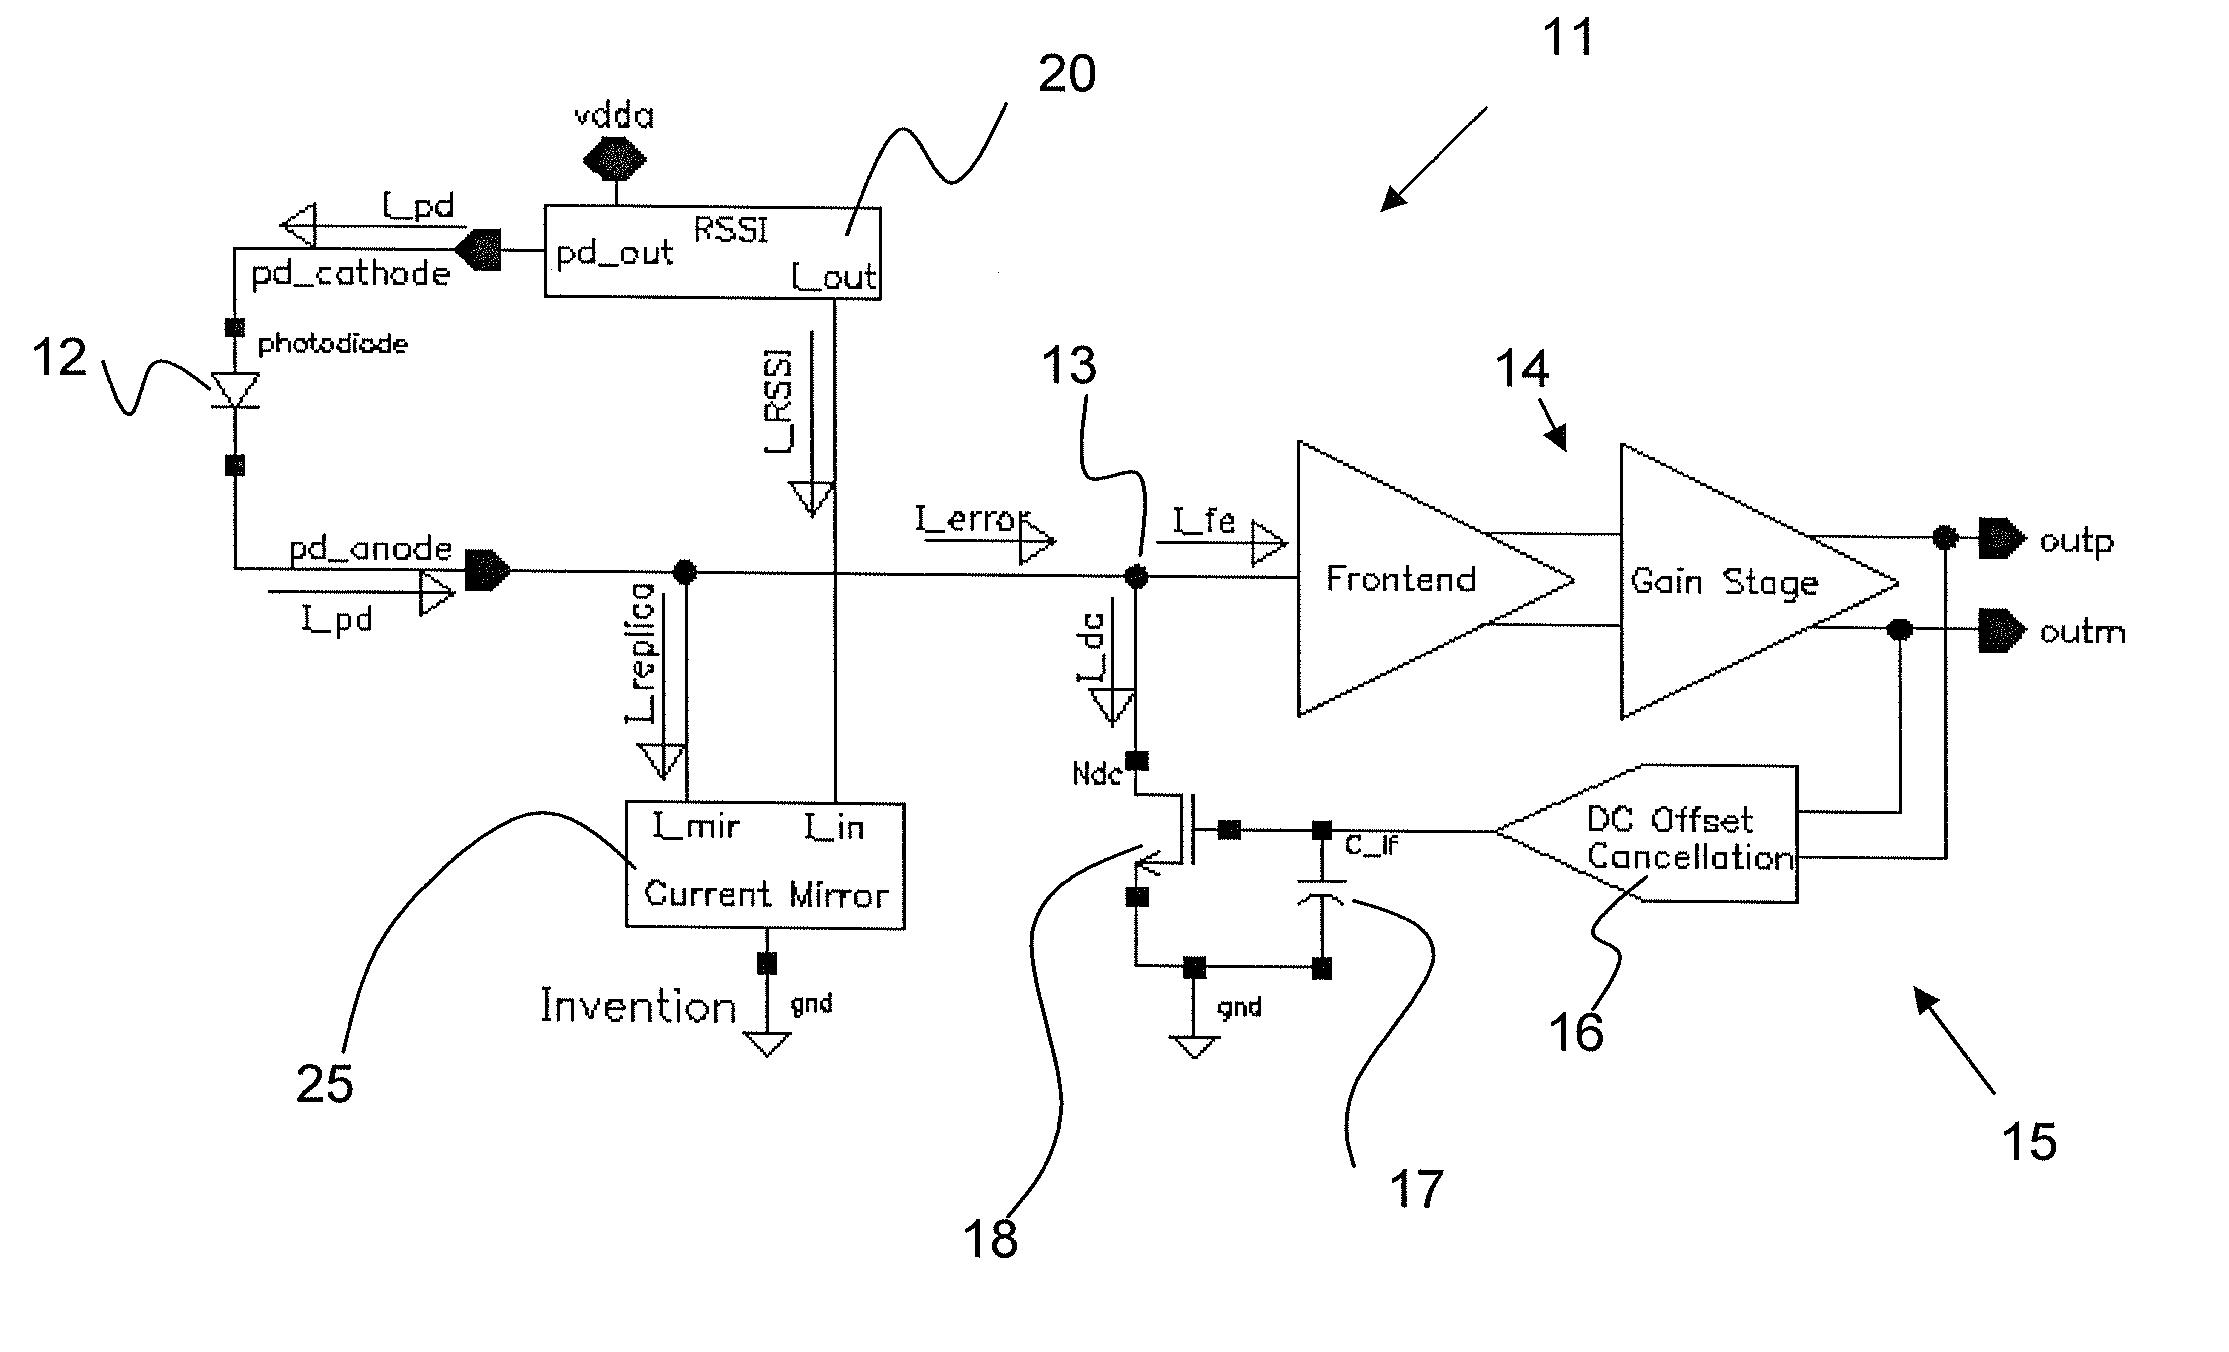 Chevy Tbi Vacuum Line Diagram File Name 0900c15280098f35gif